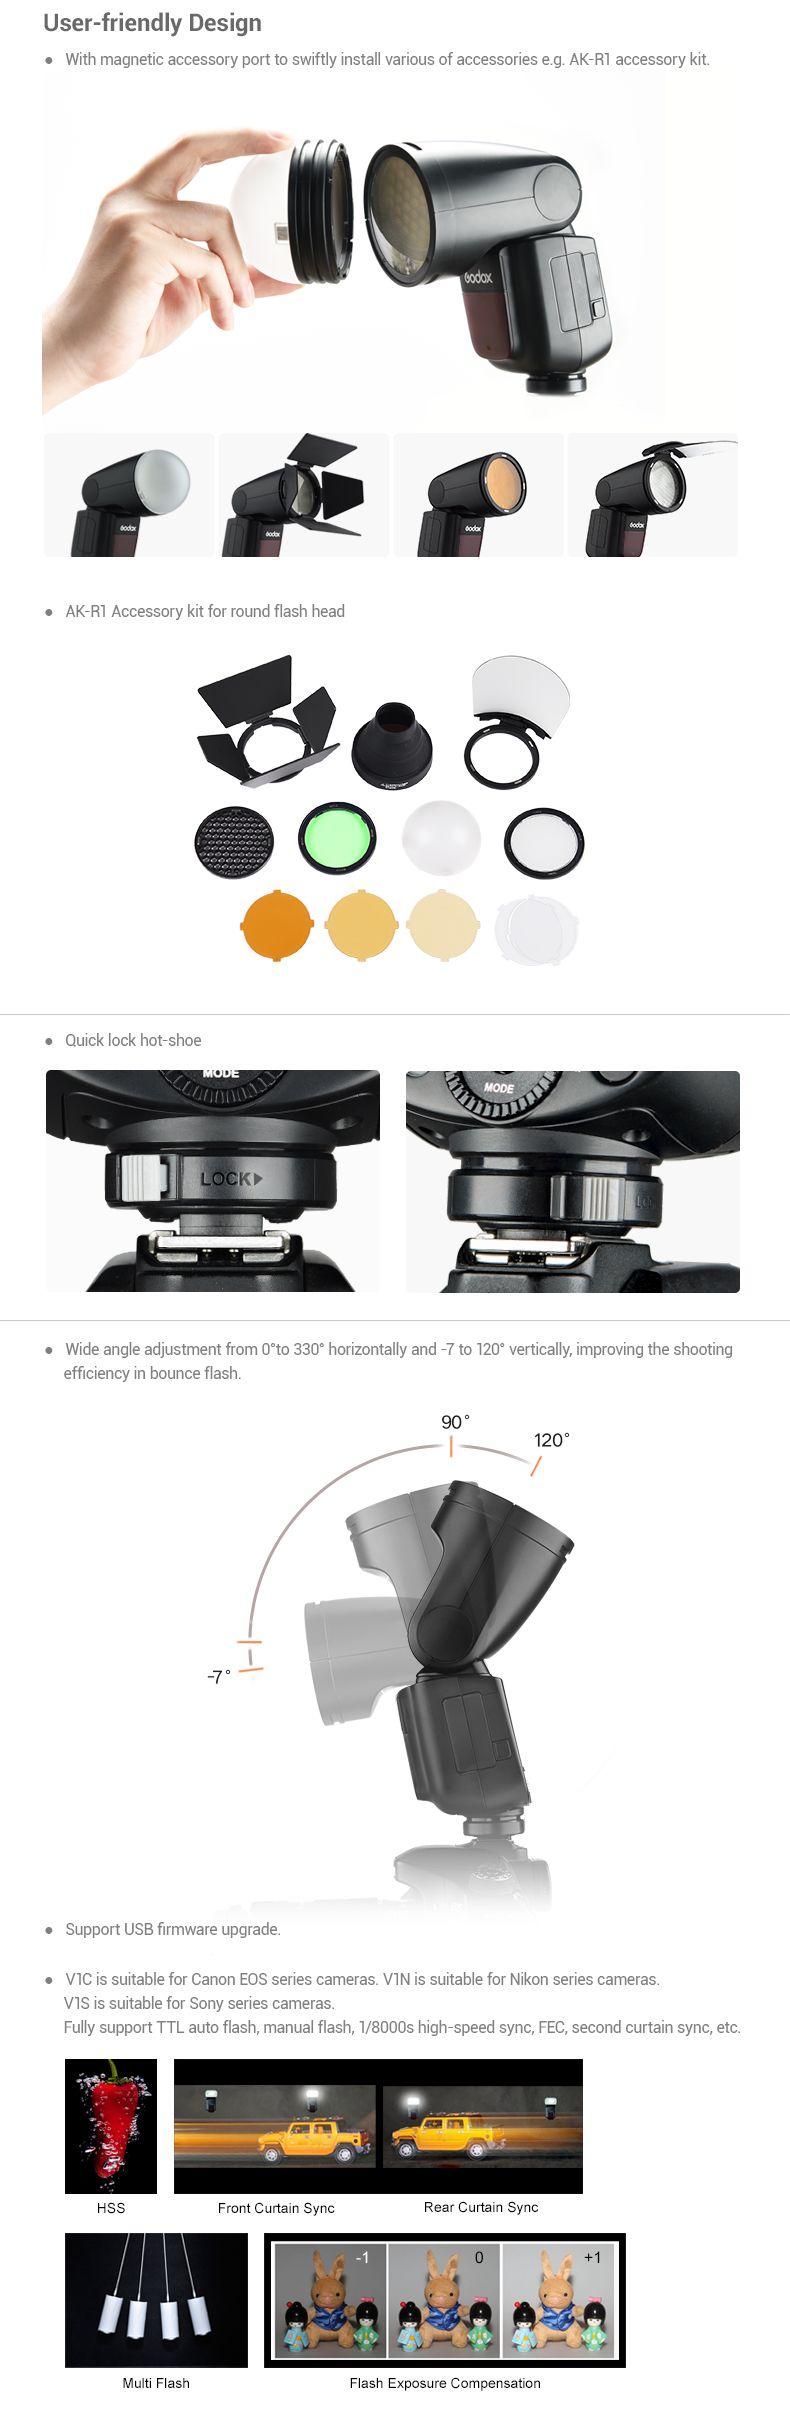 Godox V1 round head flash - User Friendly Design. Wide angle adjustment.